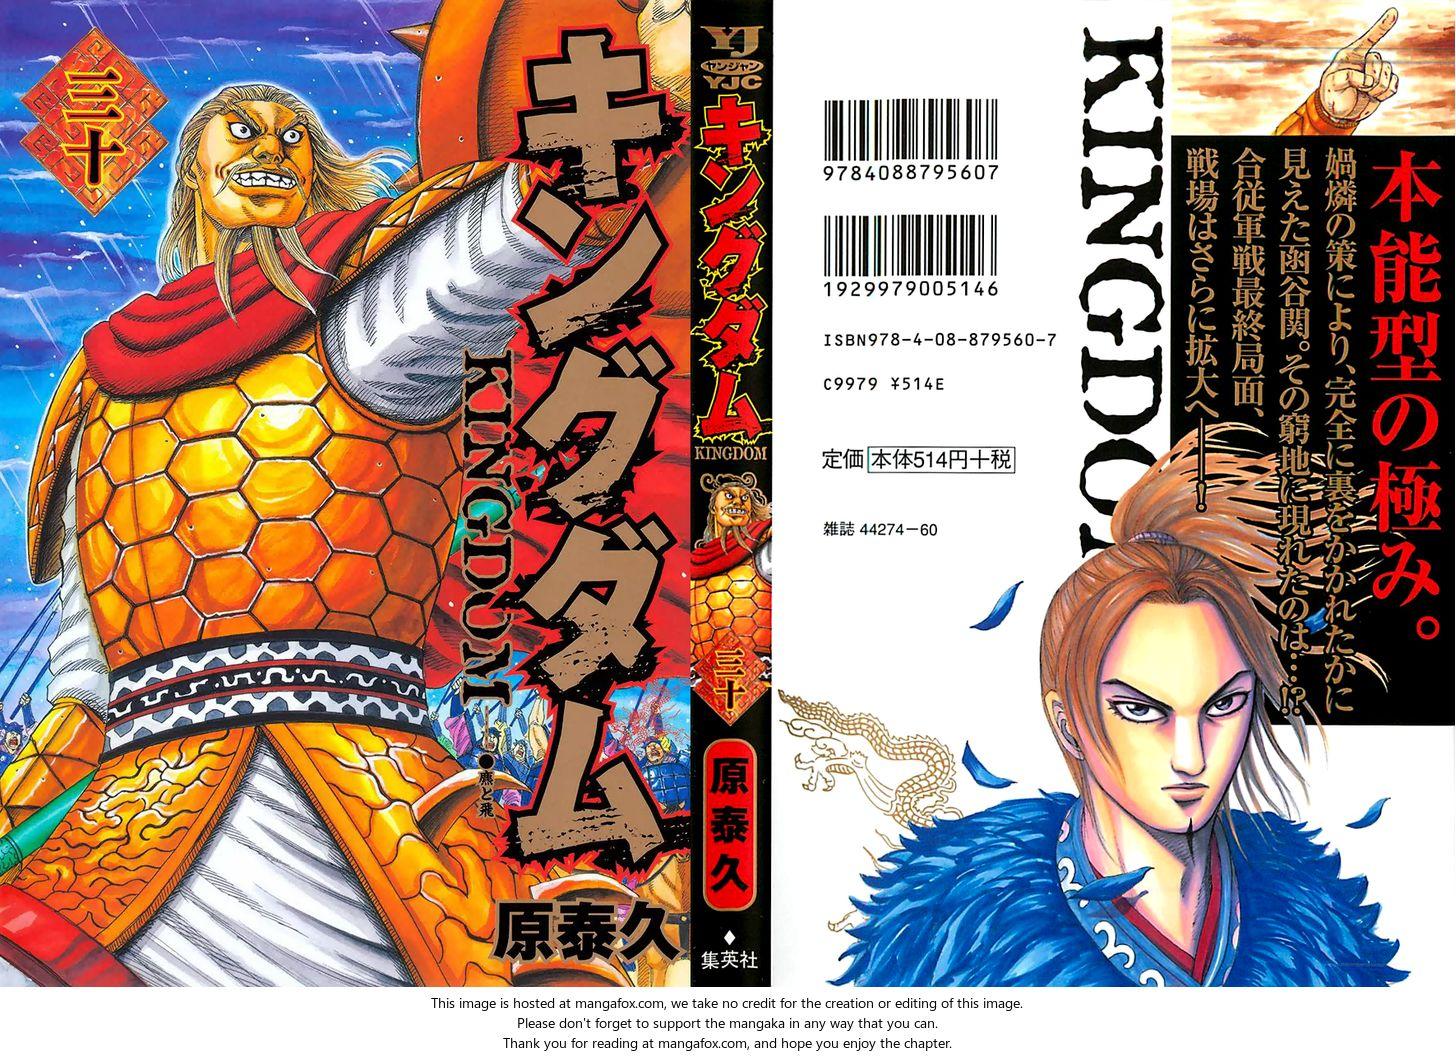 Kingdom 317: Inside Kankoku Pass at MangaFox